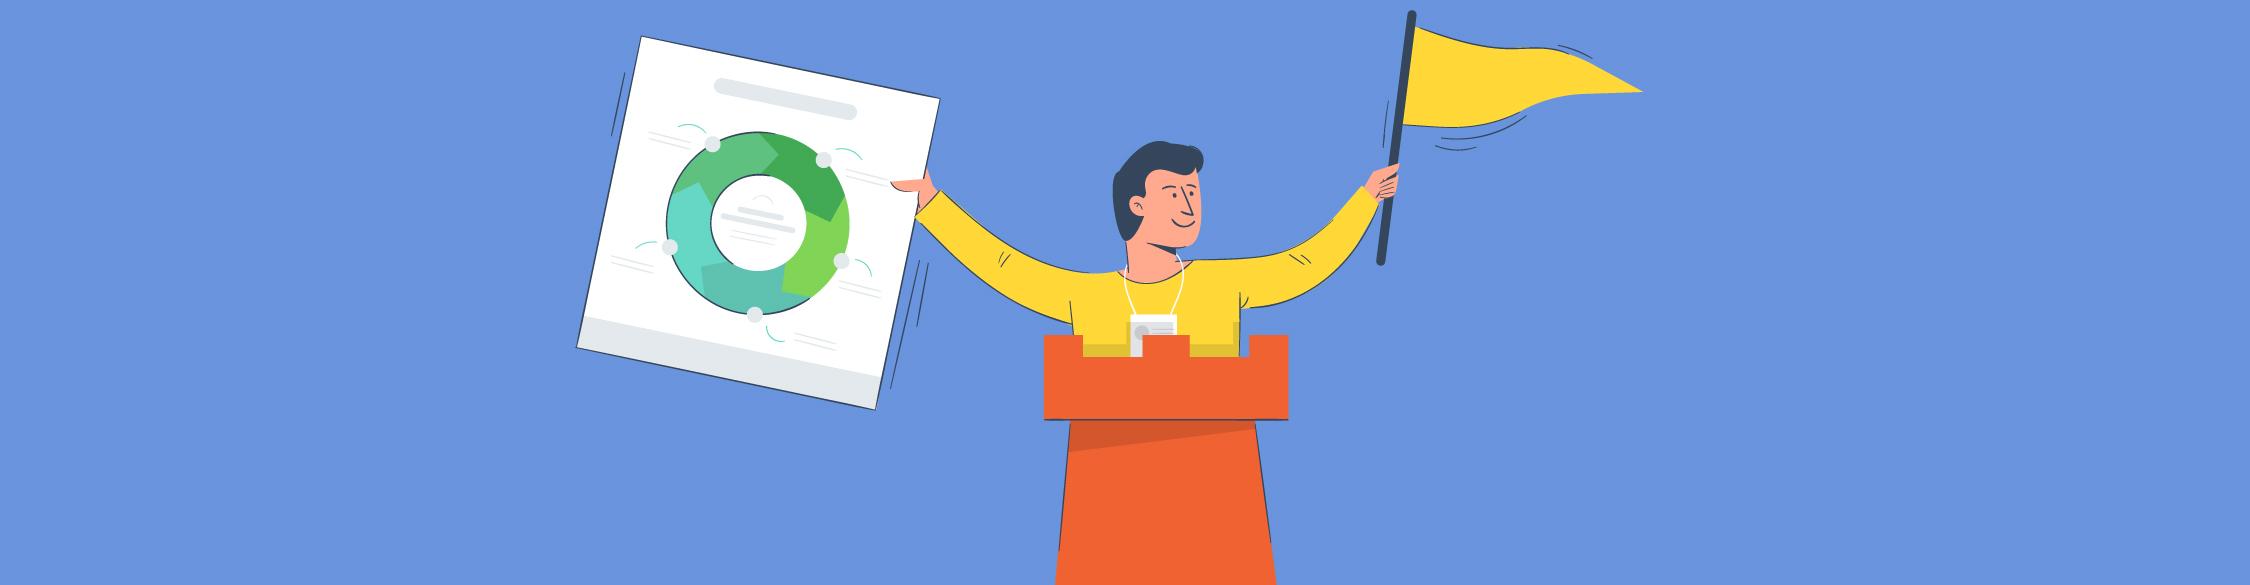 infographic marketing - header